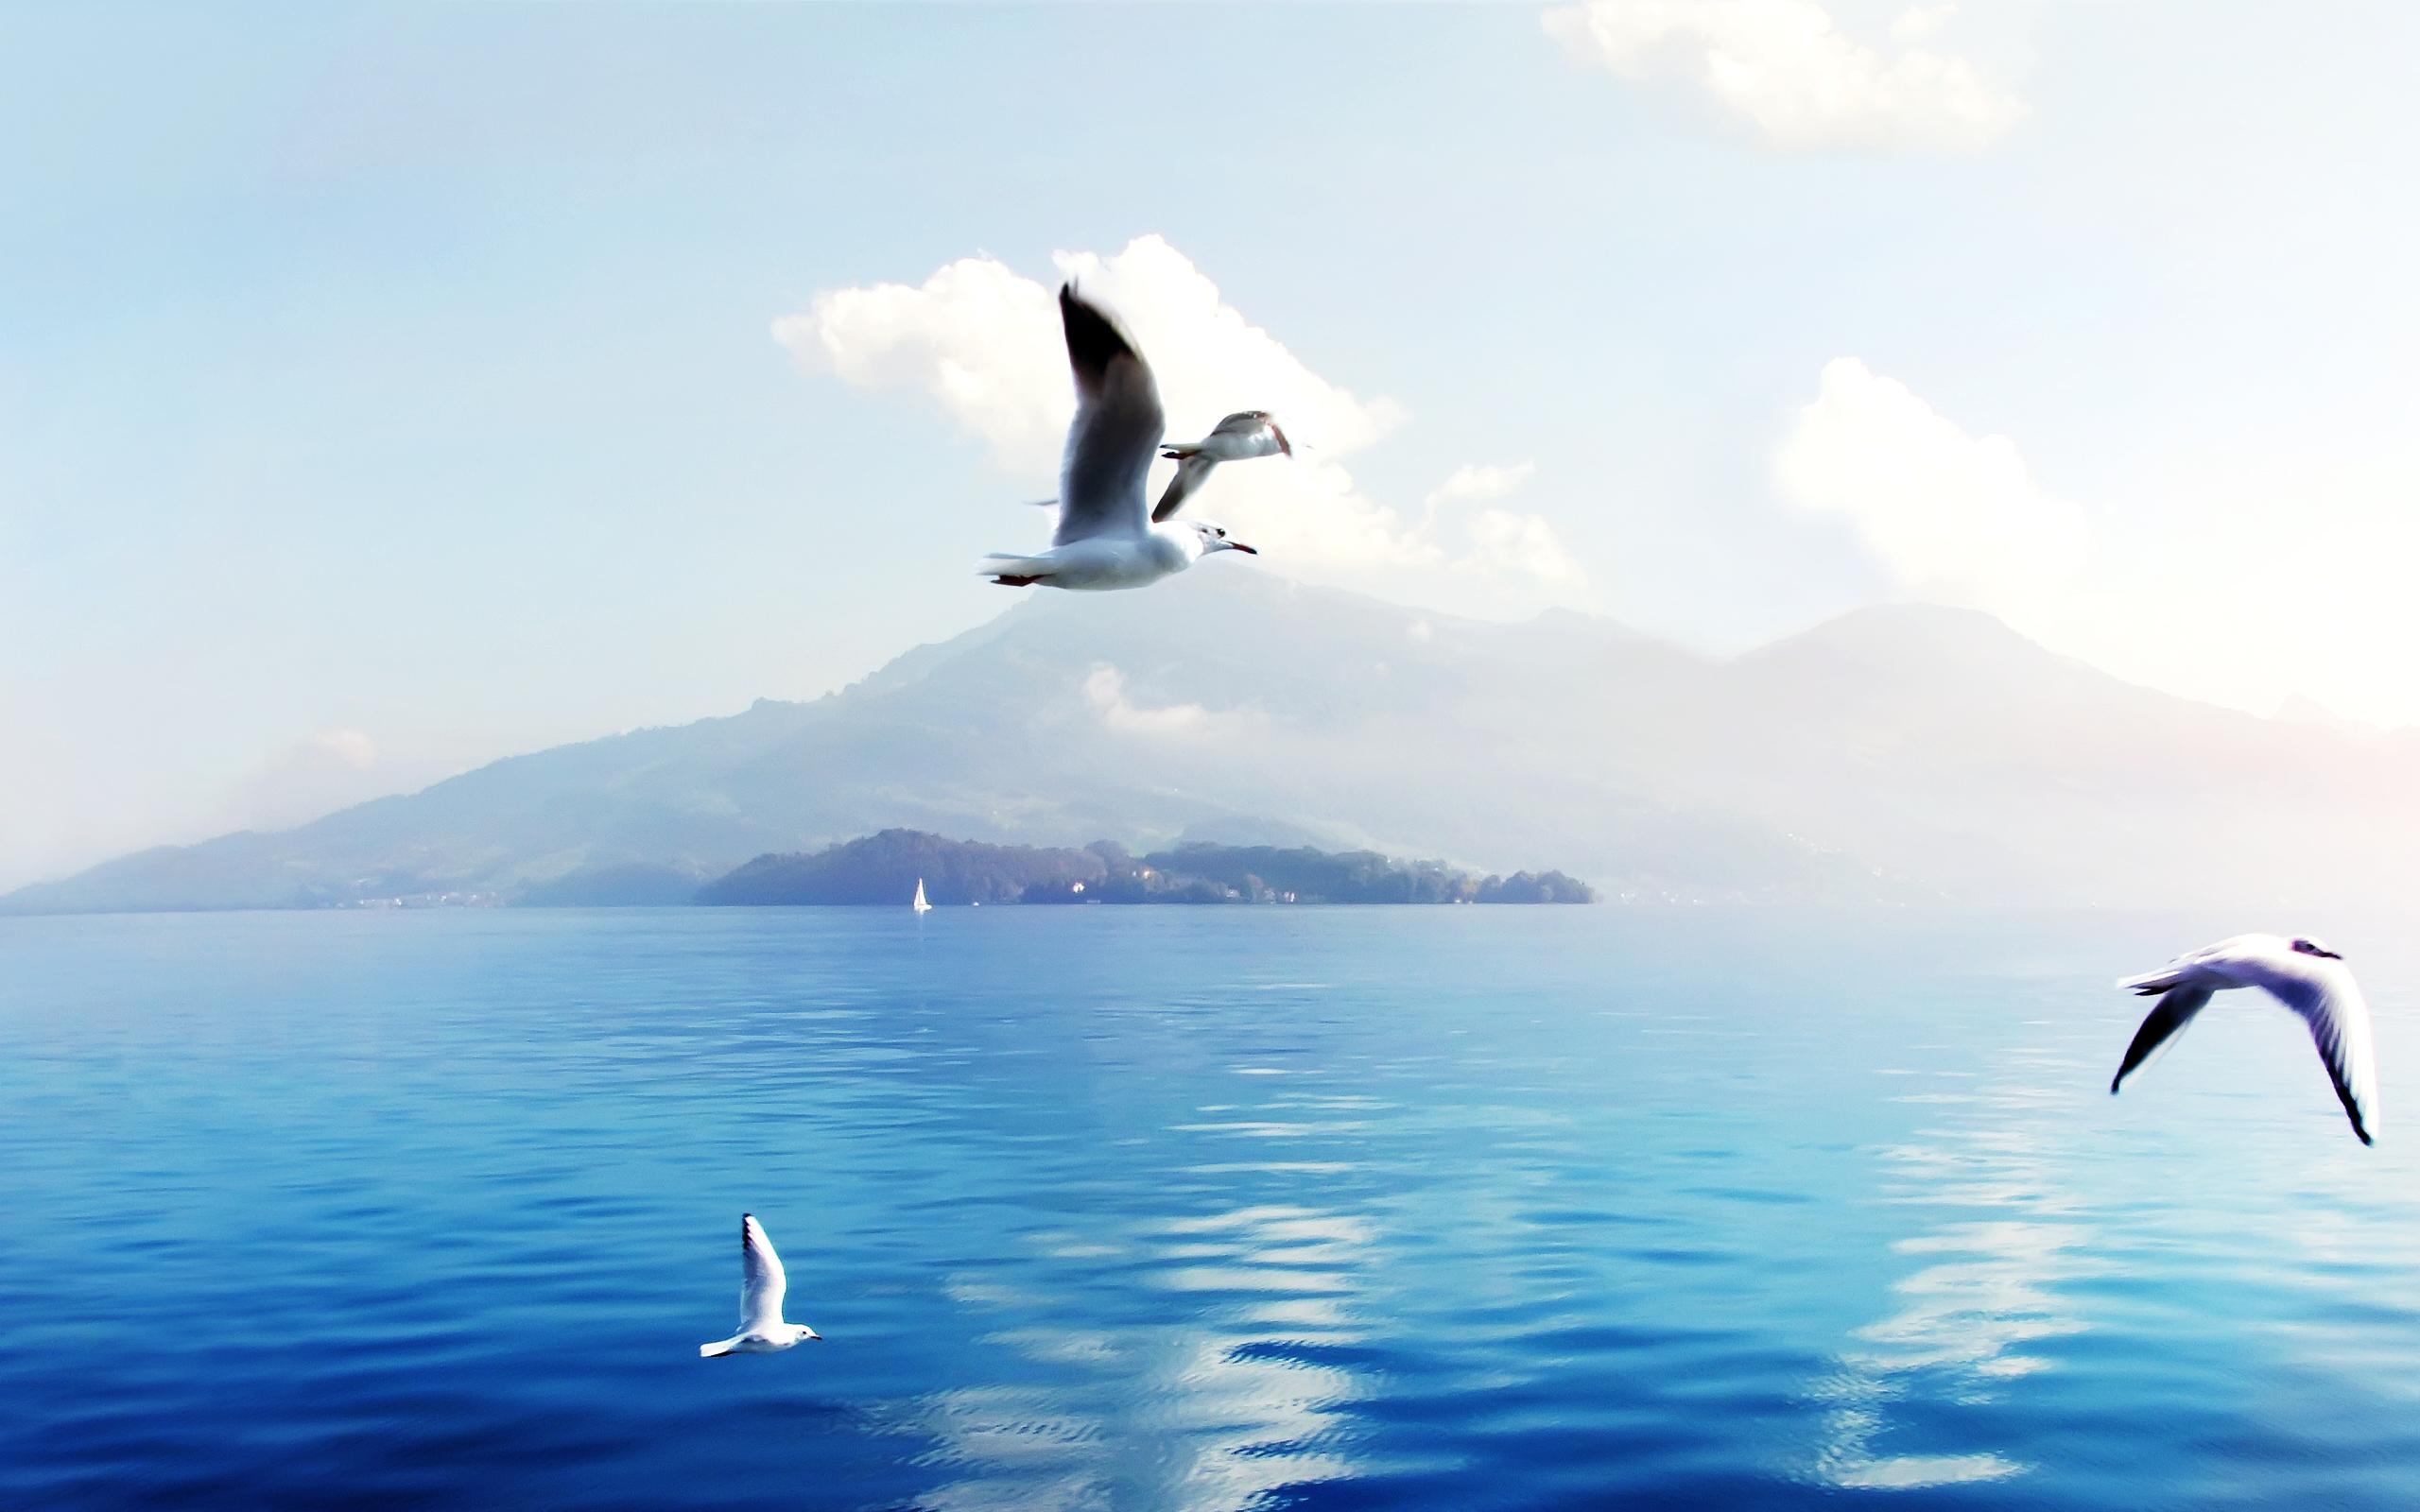 HD Wallpapers Seagulls in Switzerl